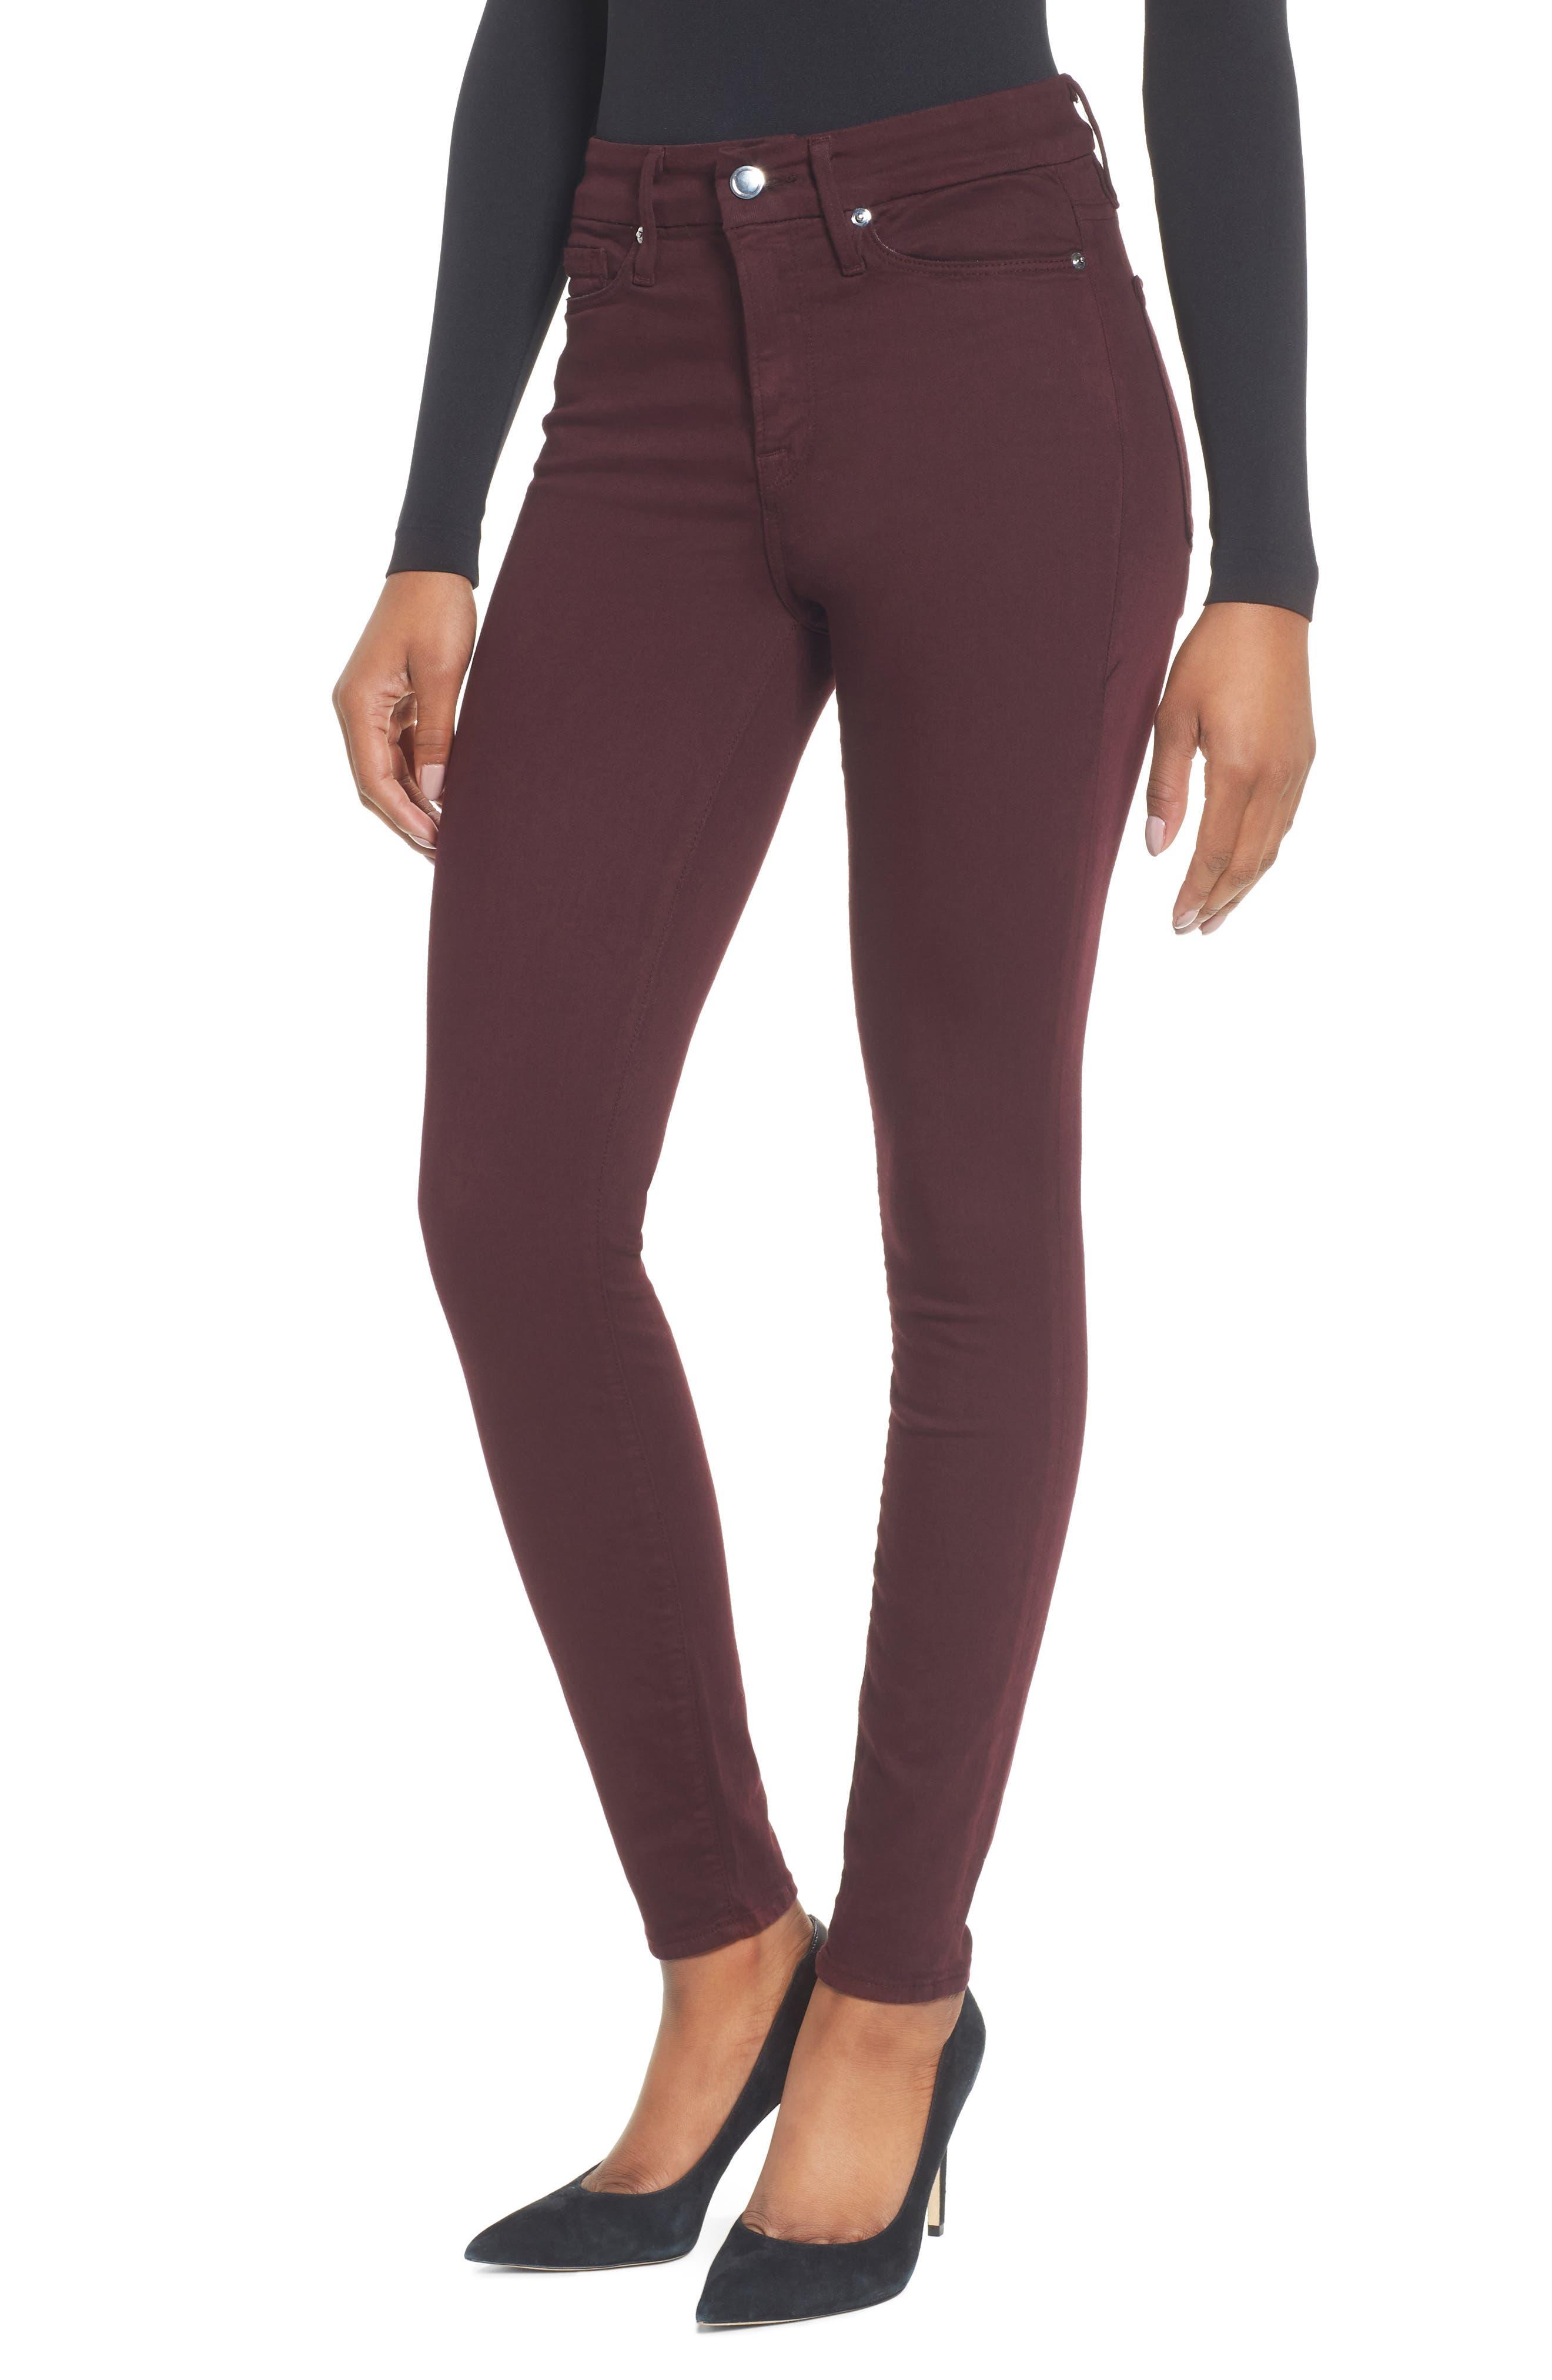 Burgundy skinny jeans h&m